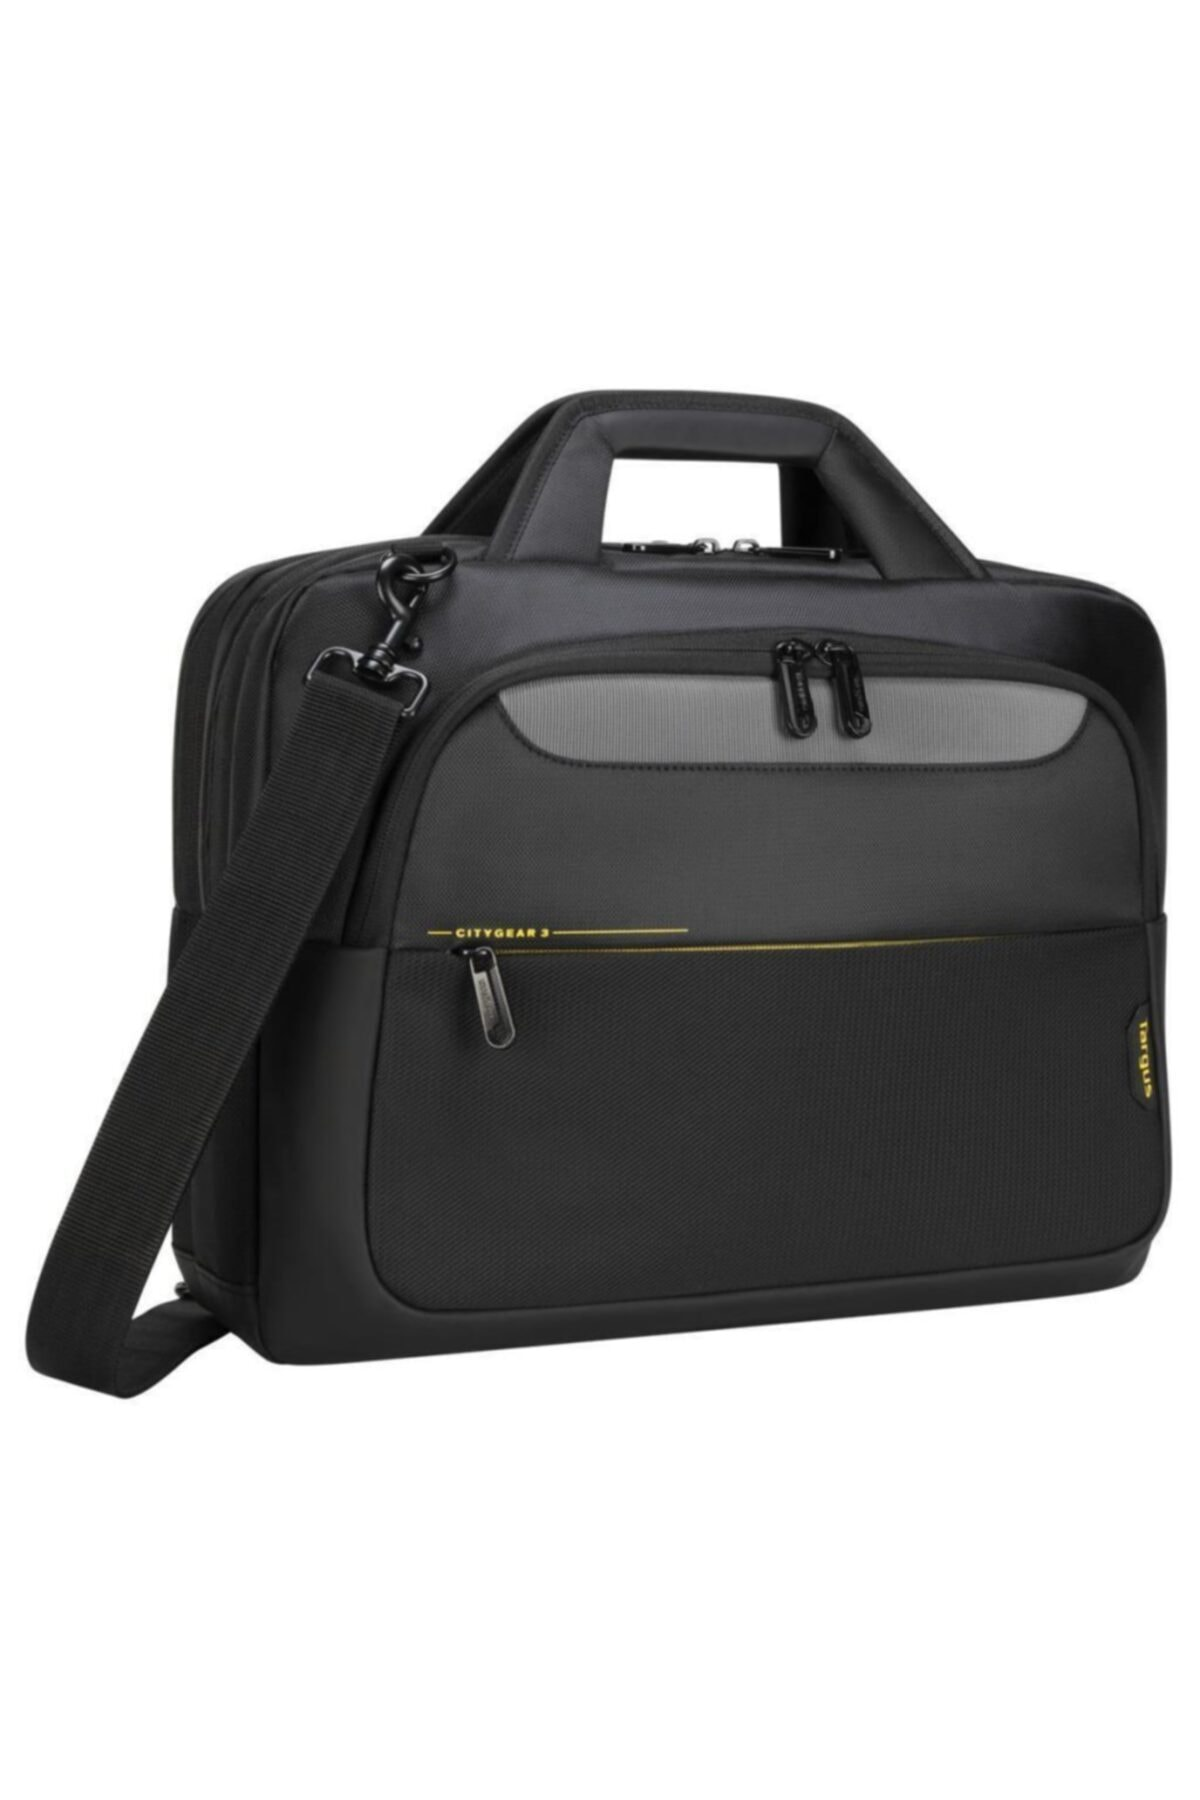 "Citygear 15-17.3"" Topload Laptop Case Black"